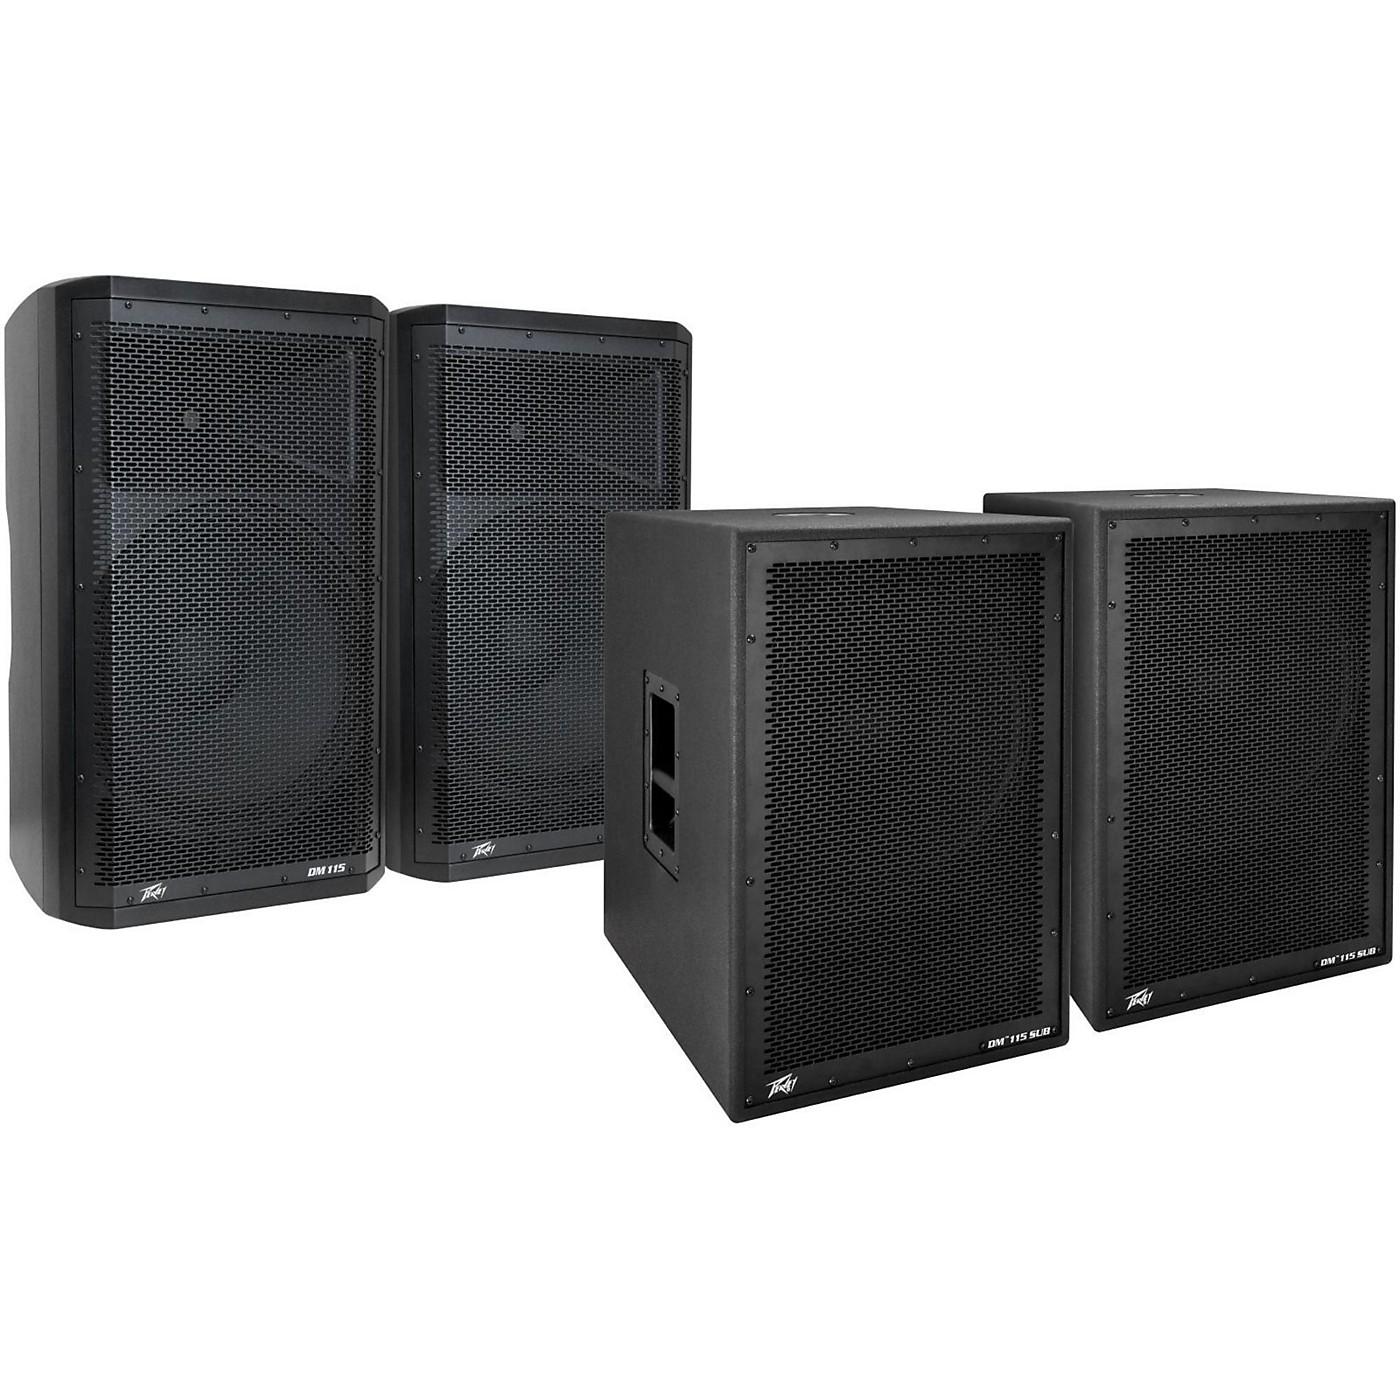 Peavey Dark Matter DM115 Powered Speaker and Sub Pair thumbnail